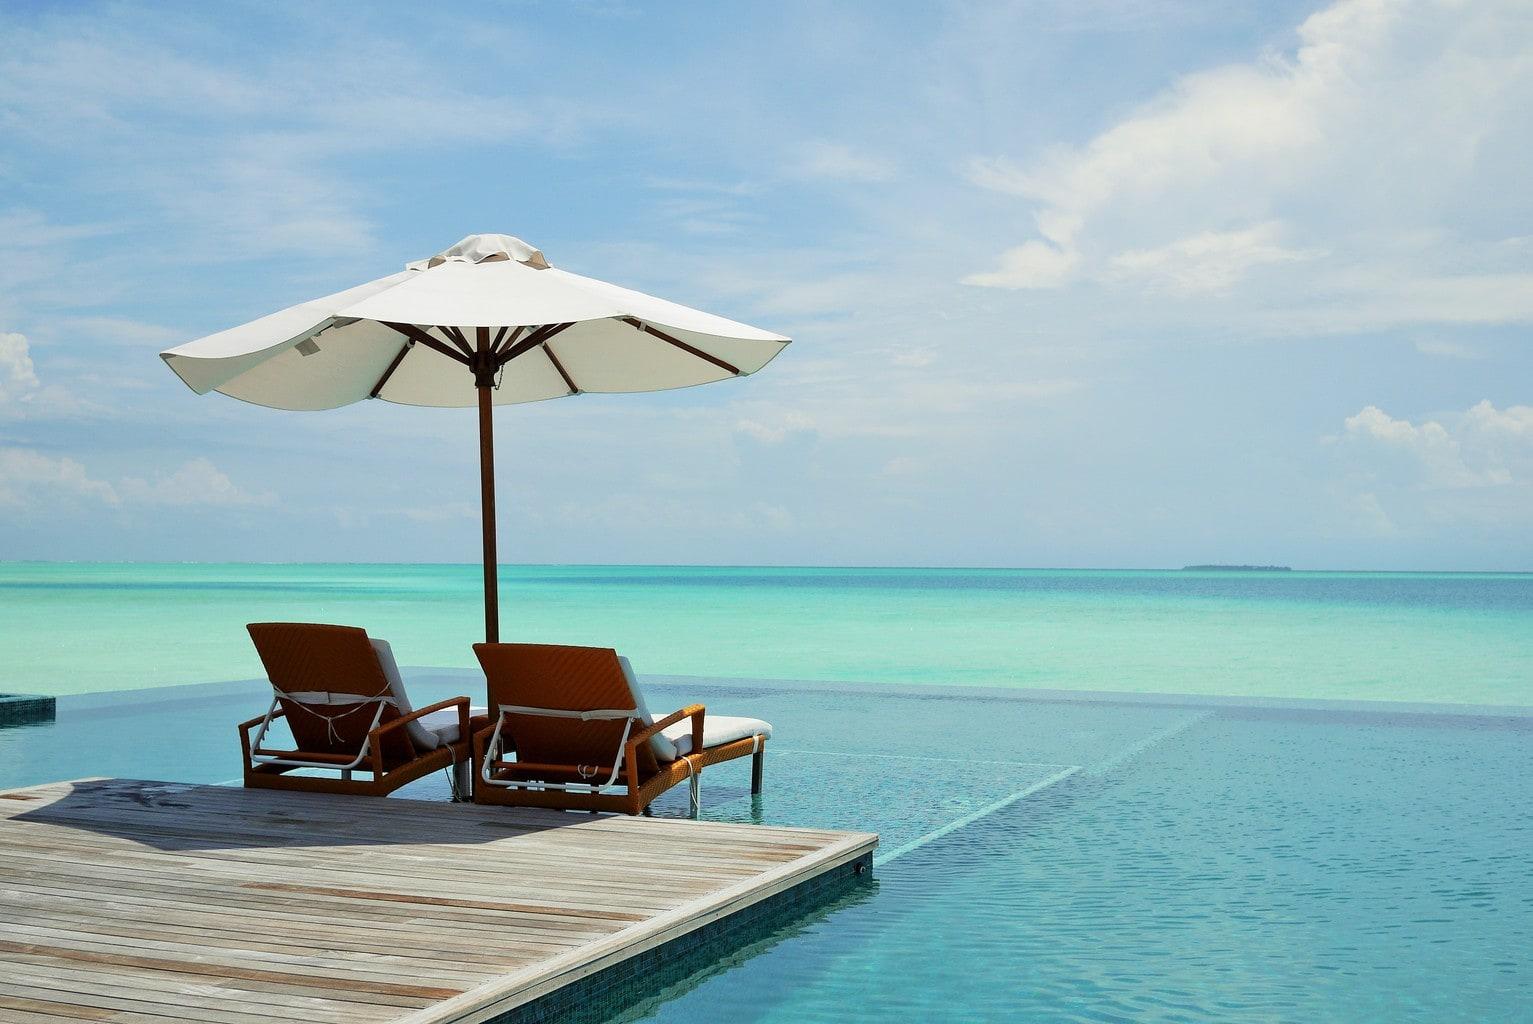 Best Hotel In Maldives For Honeymoon